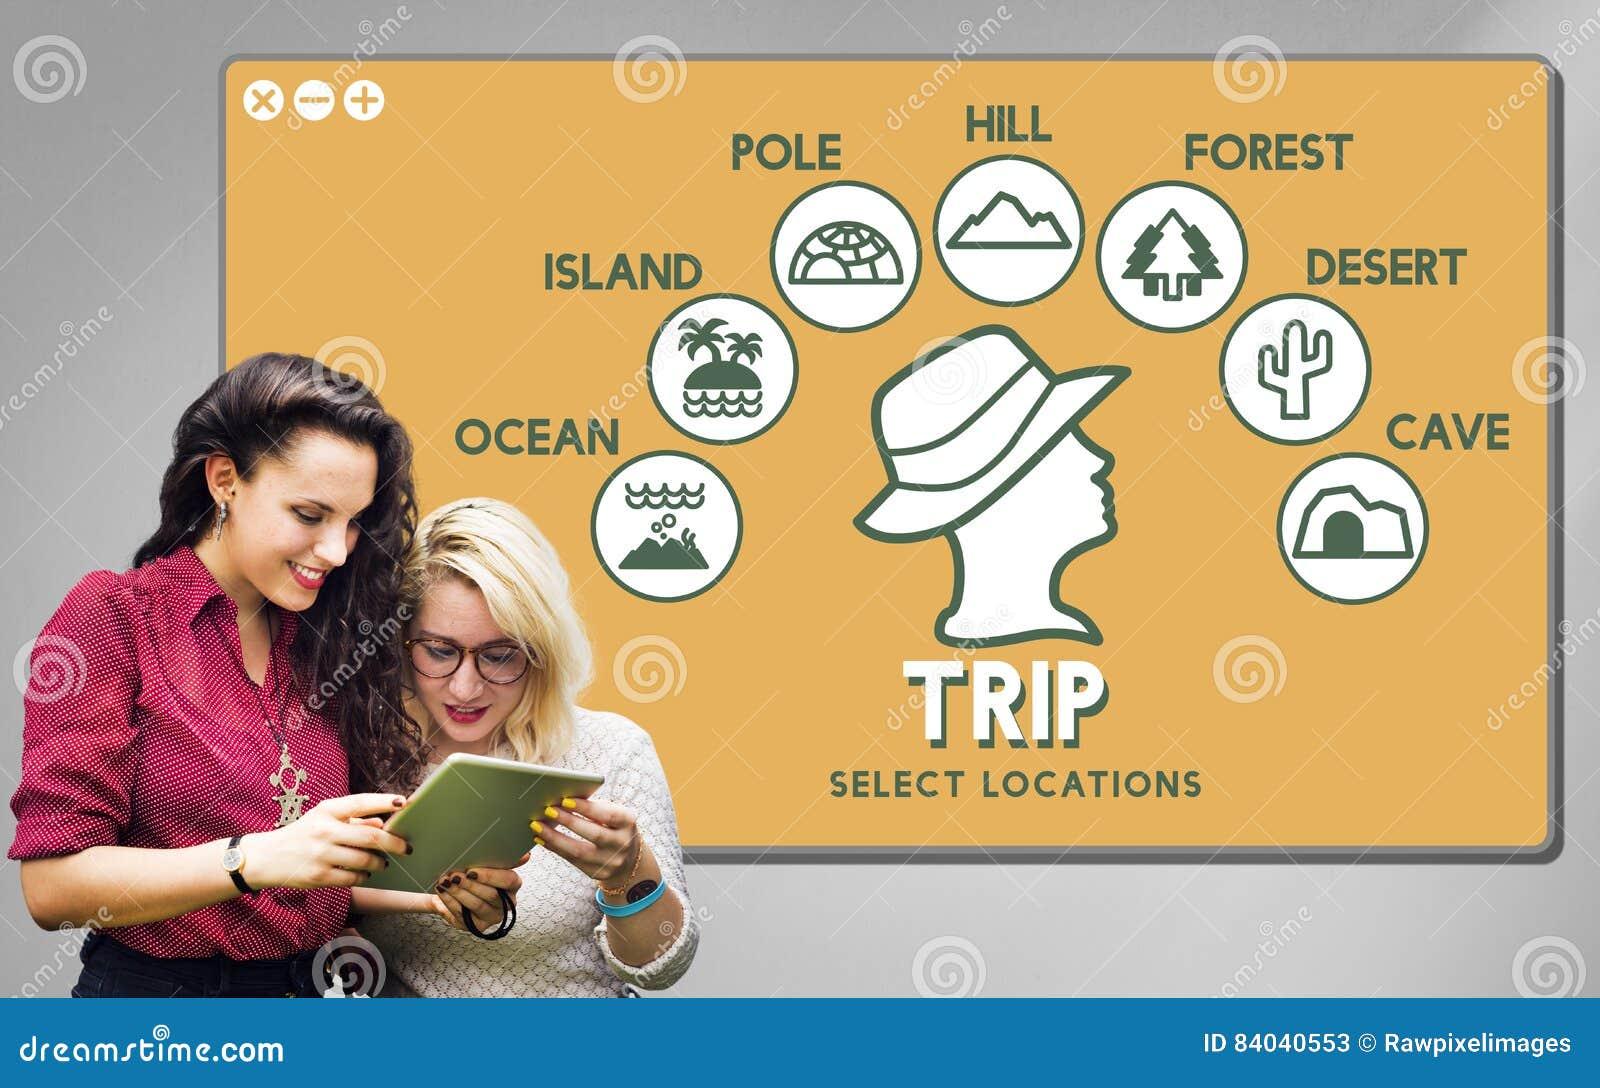 Reise-Abenteuerreisen-Reise-Erfahrungs-Konzept